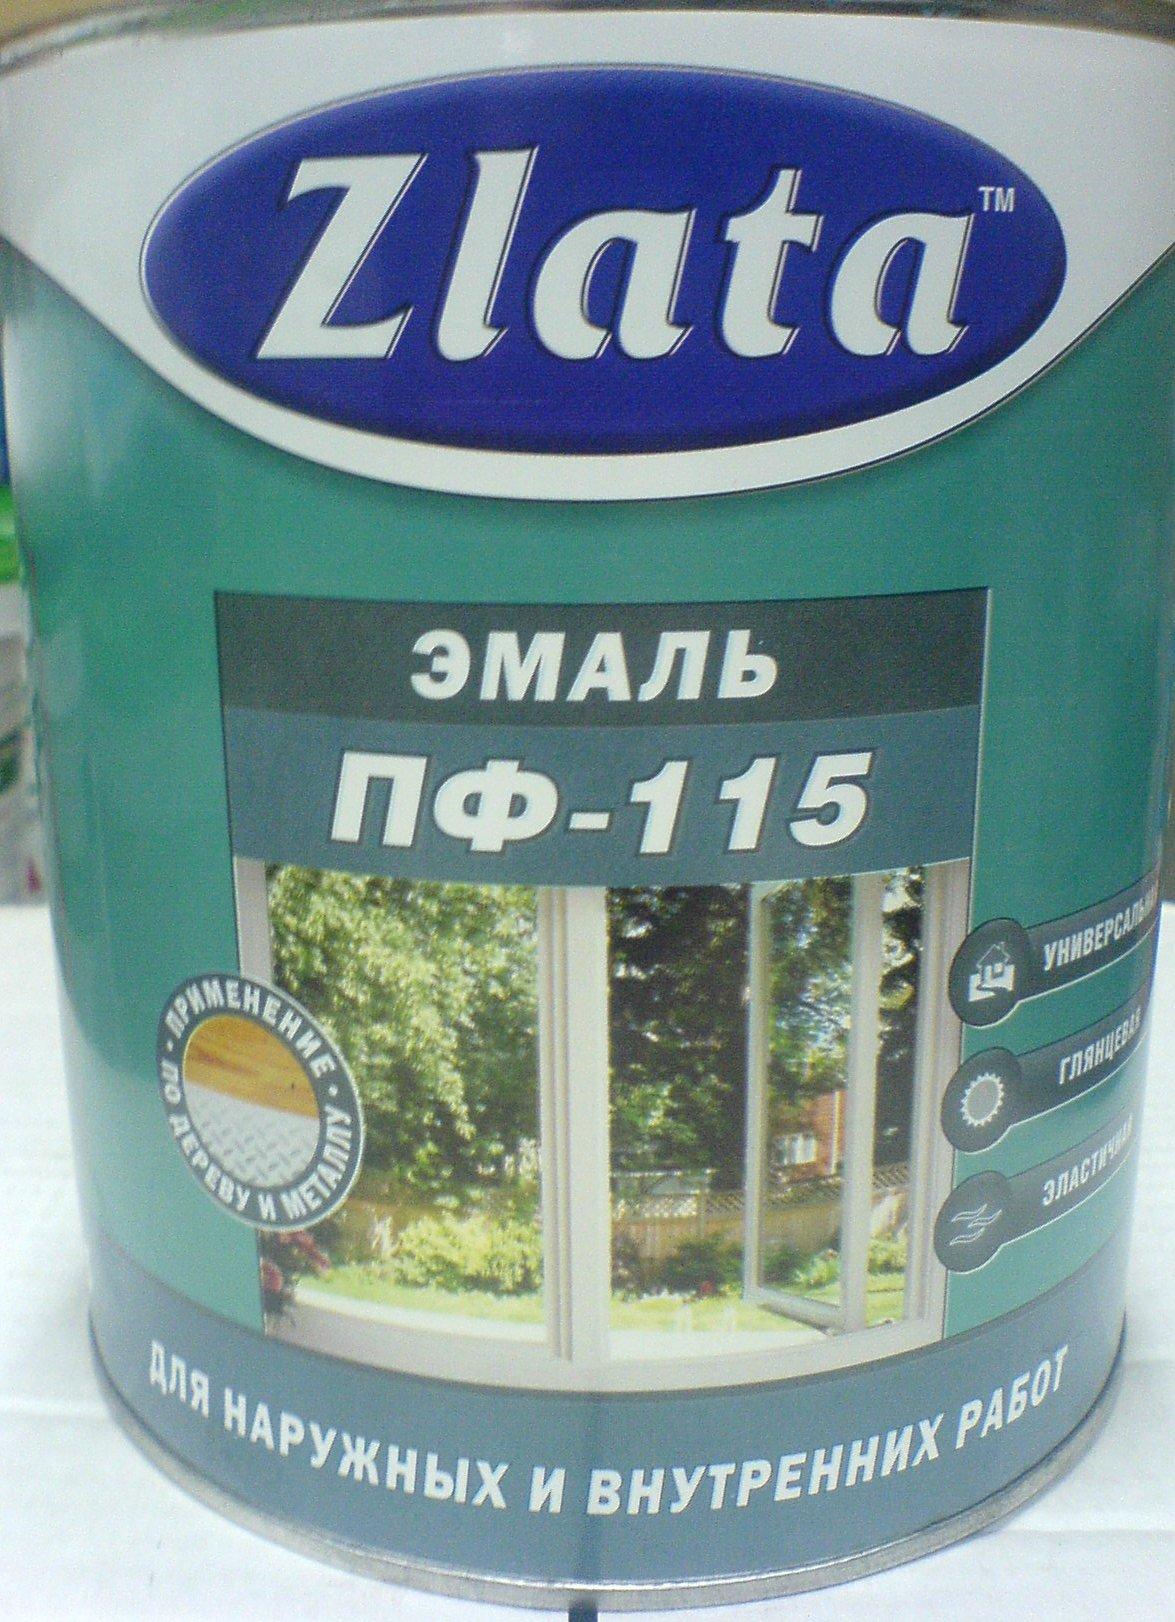 Эмаль ПФ-115 желтая, банка 2.7кг  цены